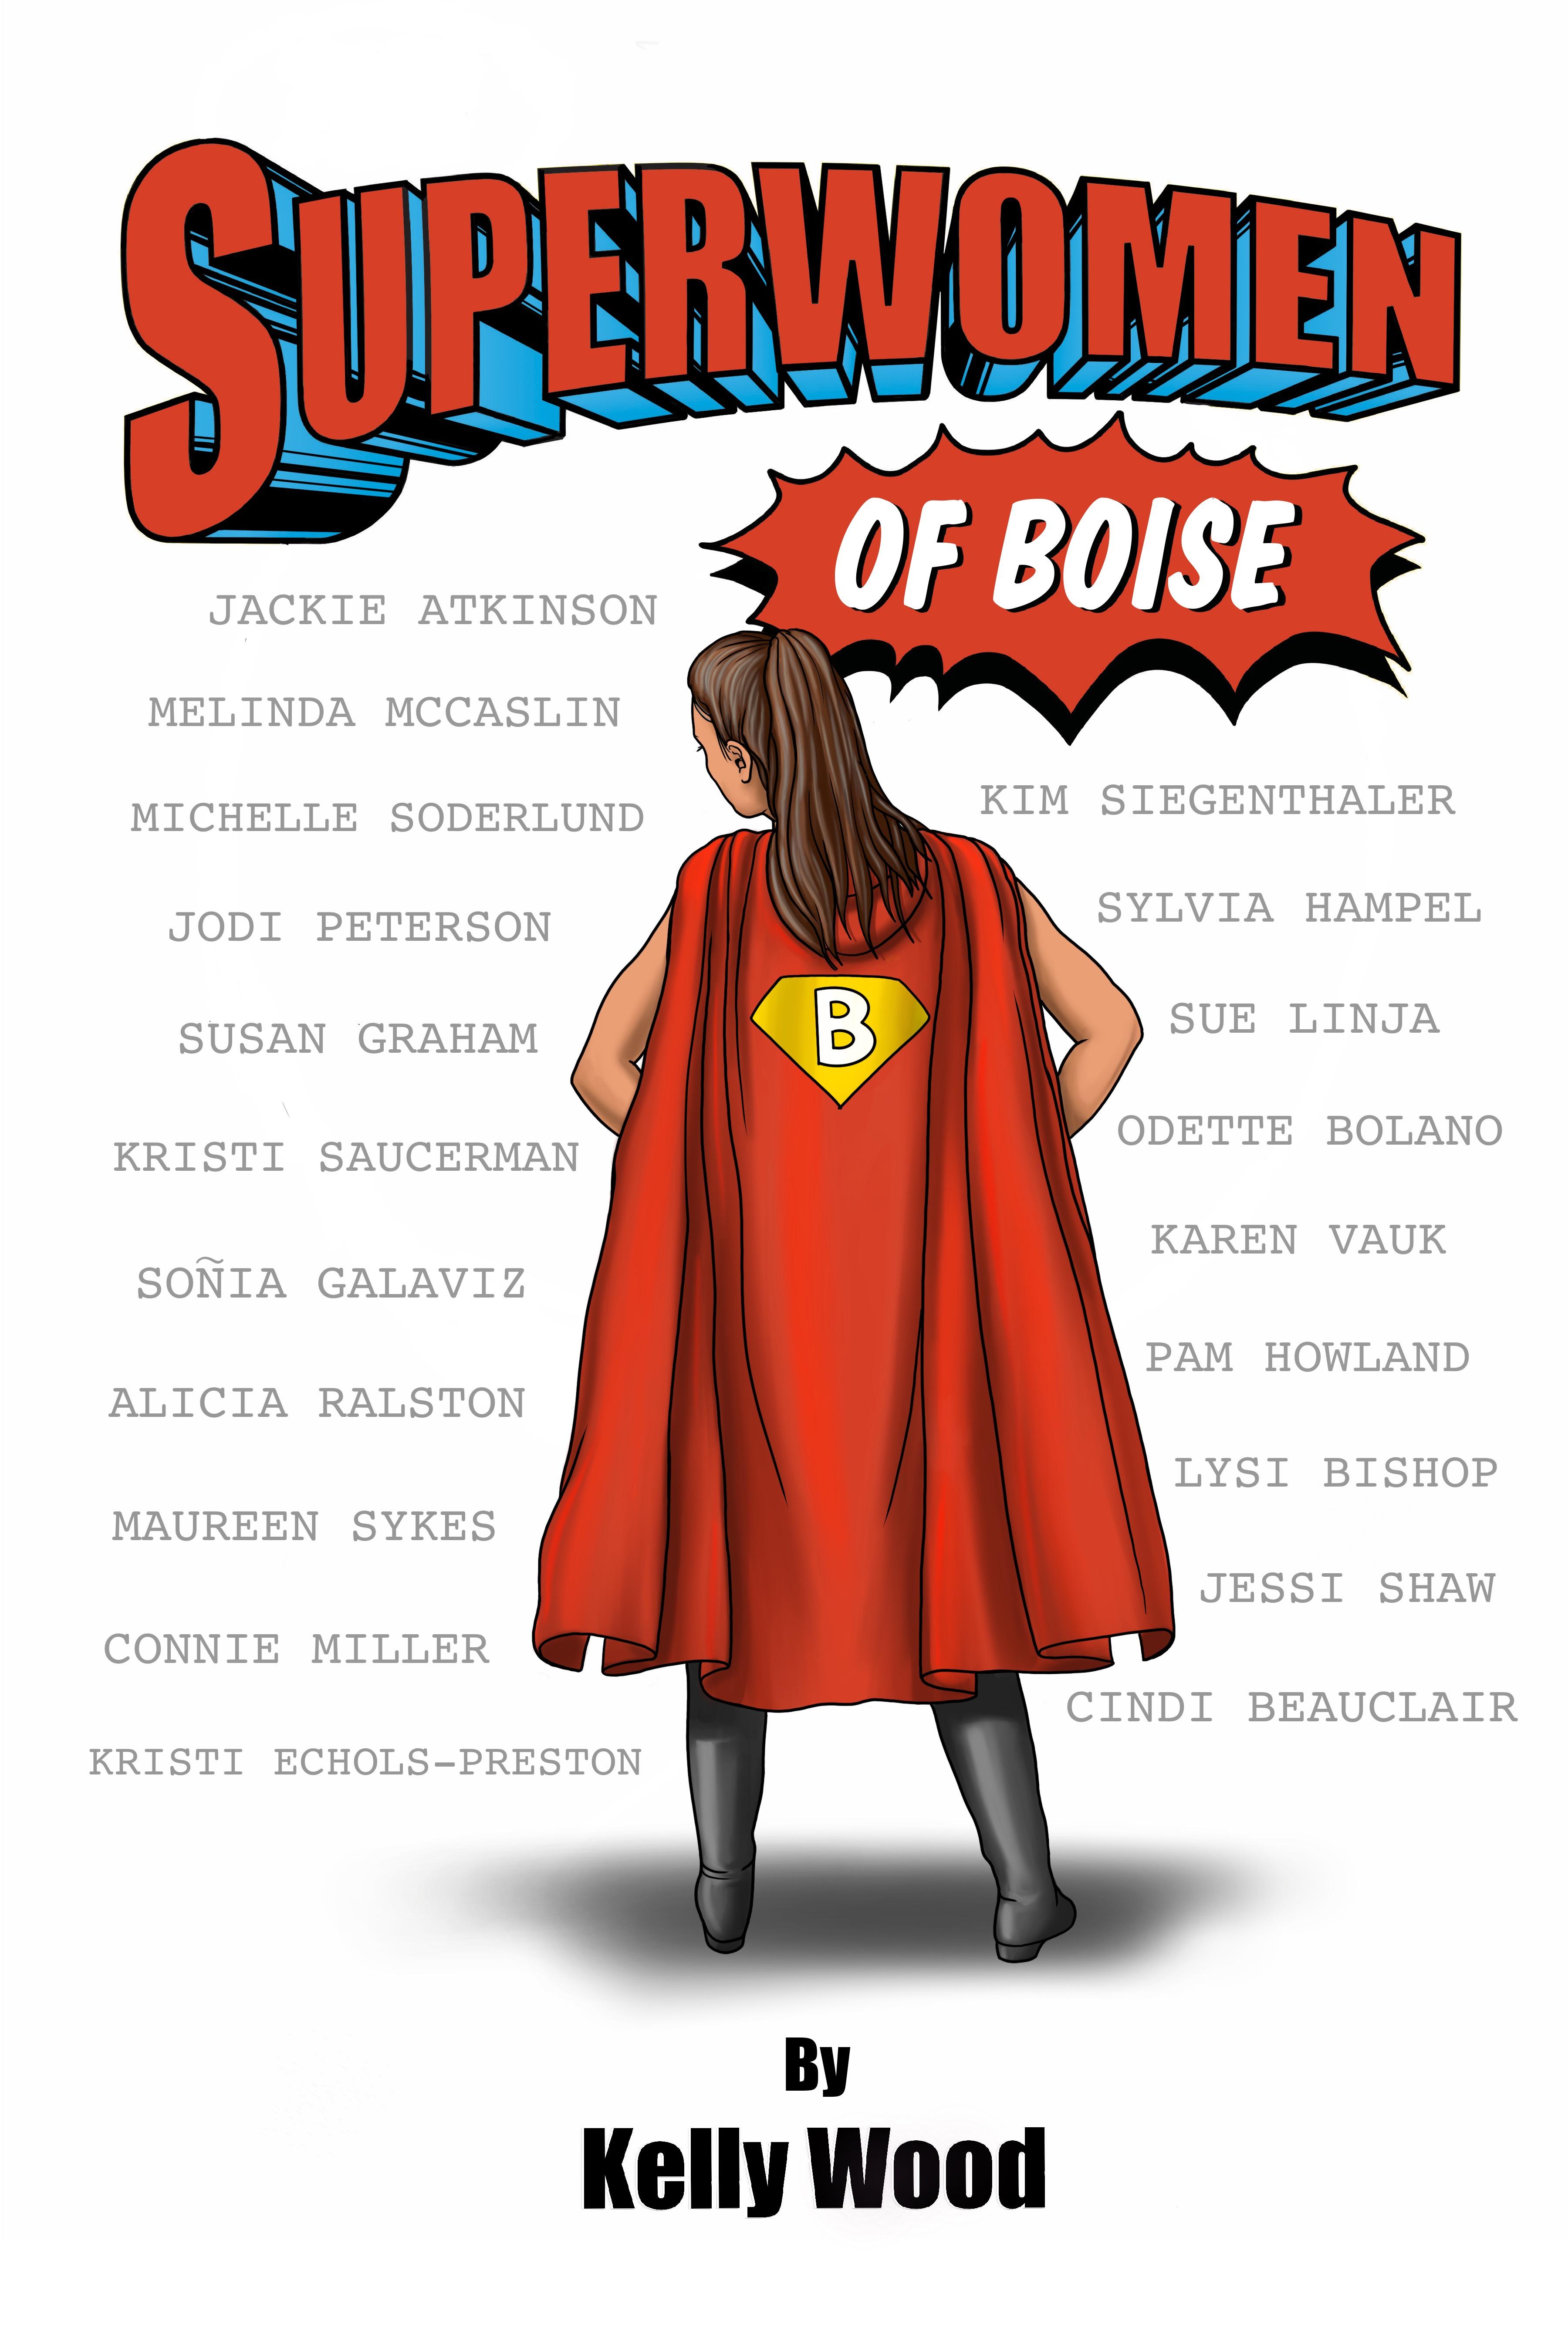 super women of boise cover